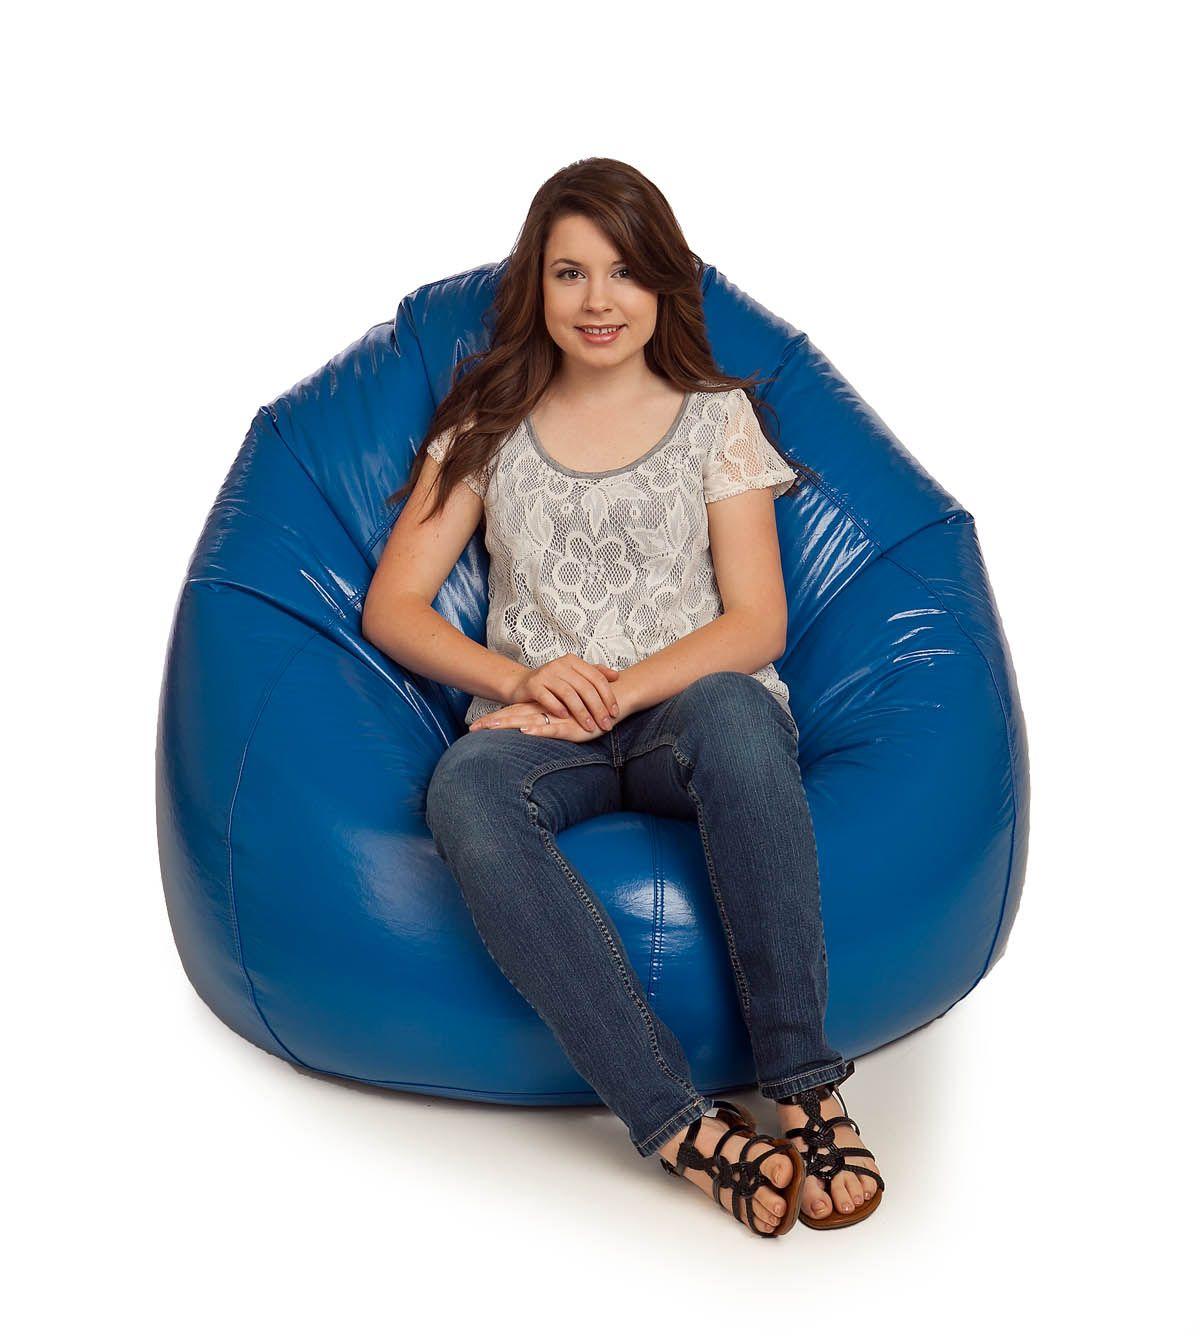 Fine Royal Blue Wet Look Vinyl Bean Bag Chair Large Large Bean Creativecarmelina Interior Chair Design Creativecarmelinacom